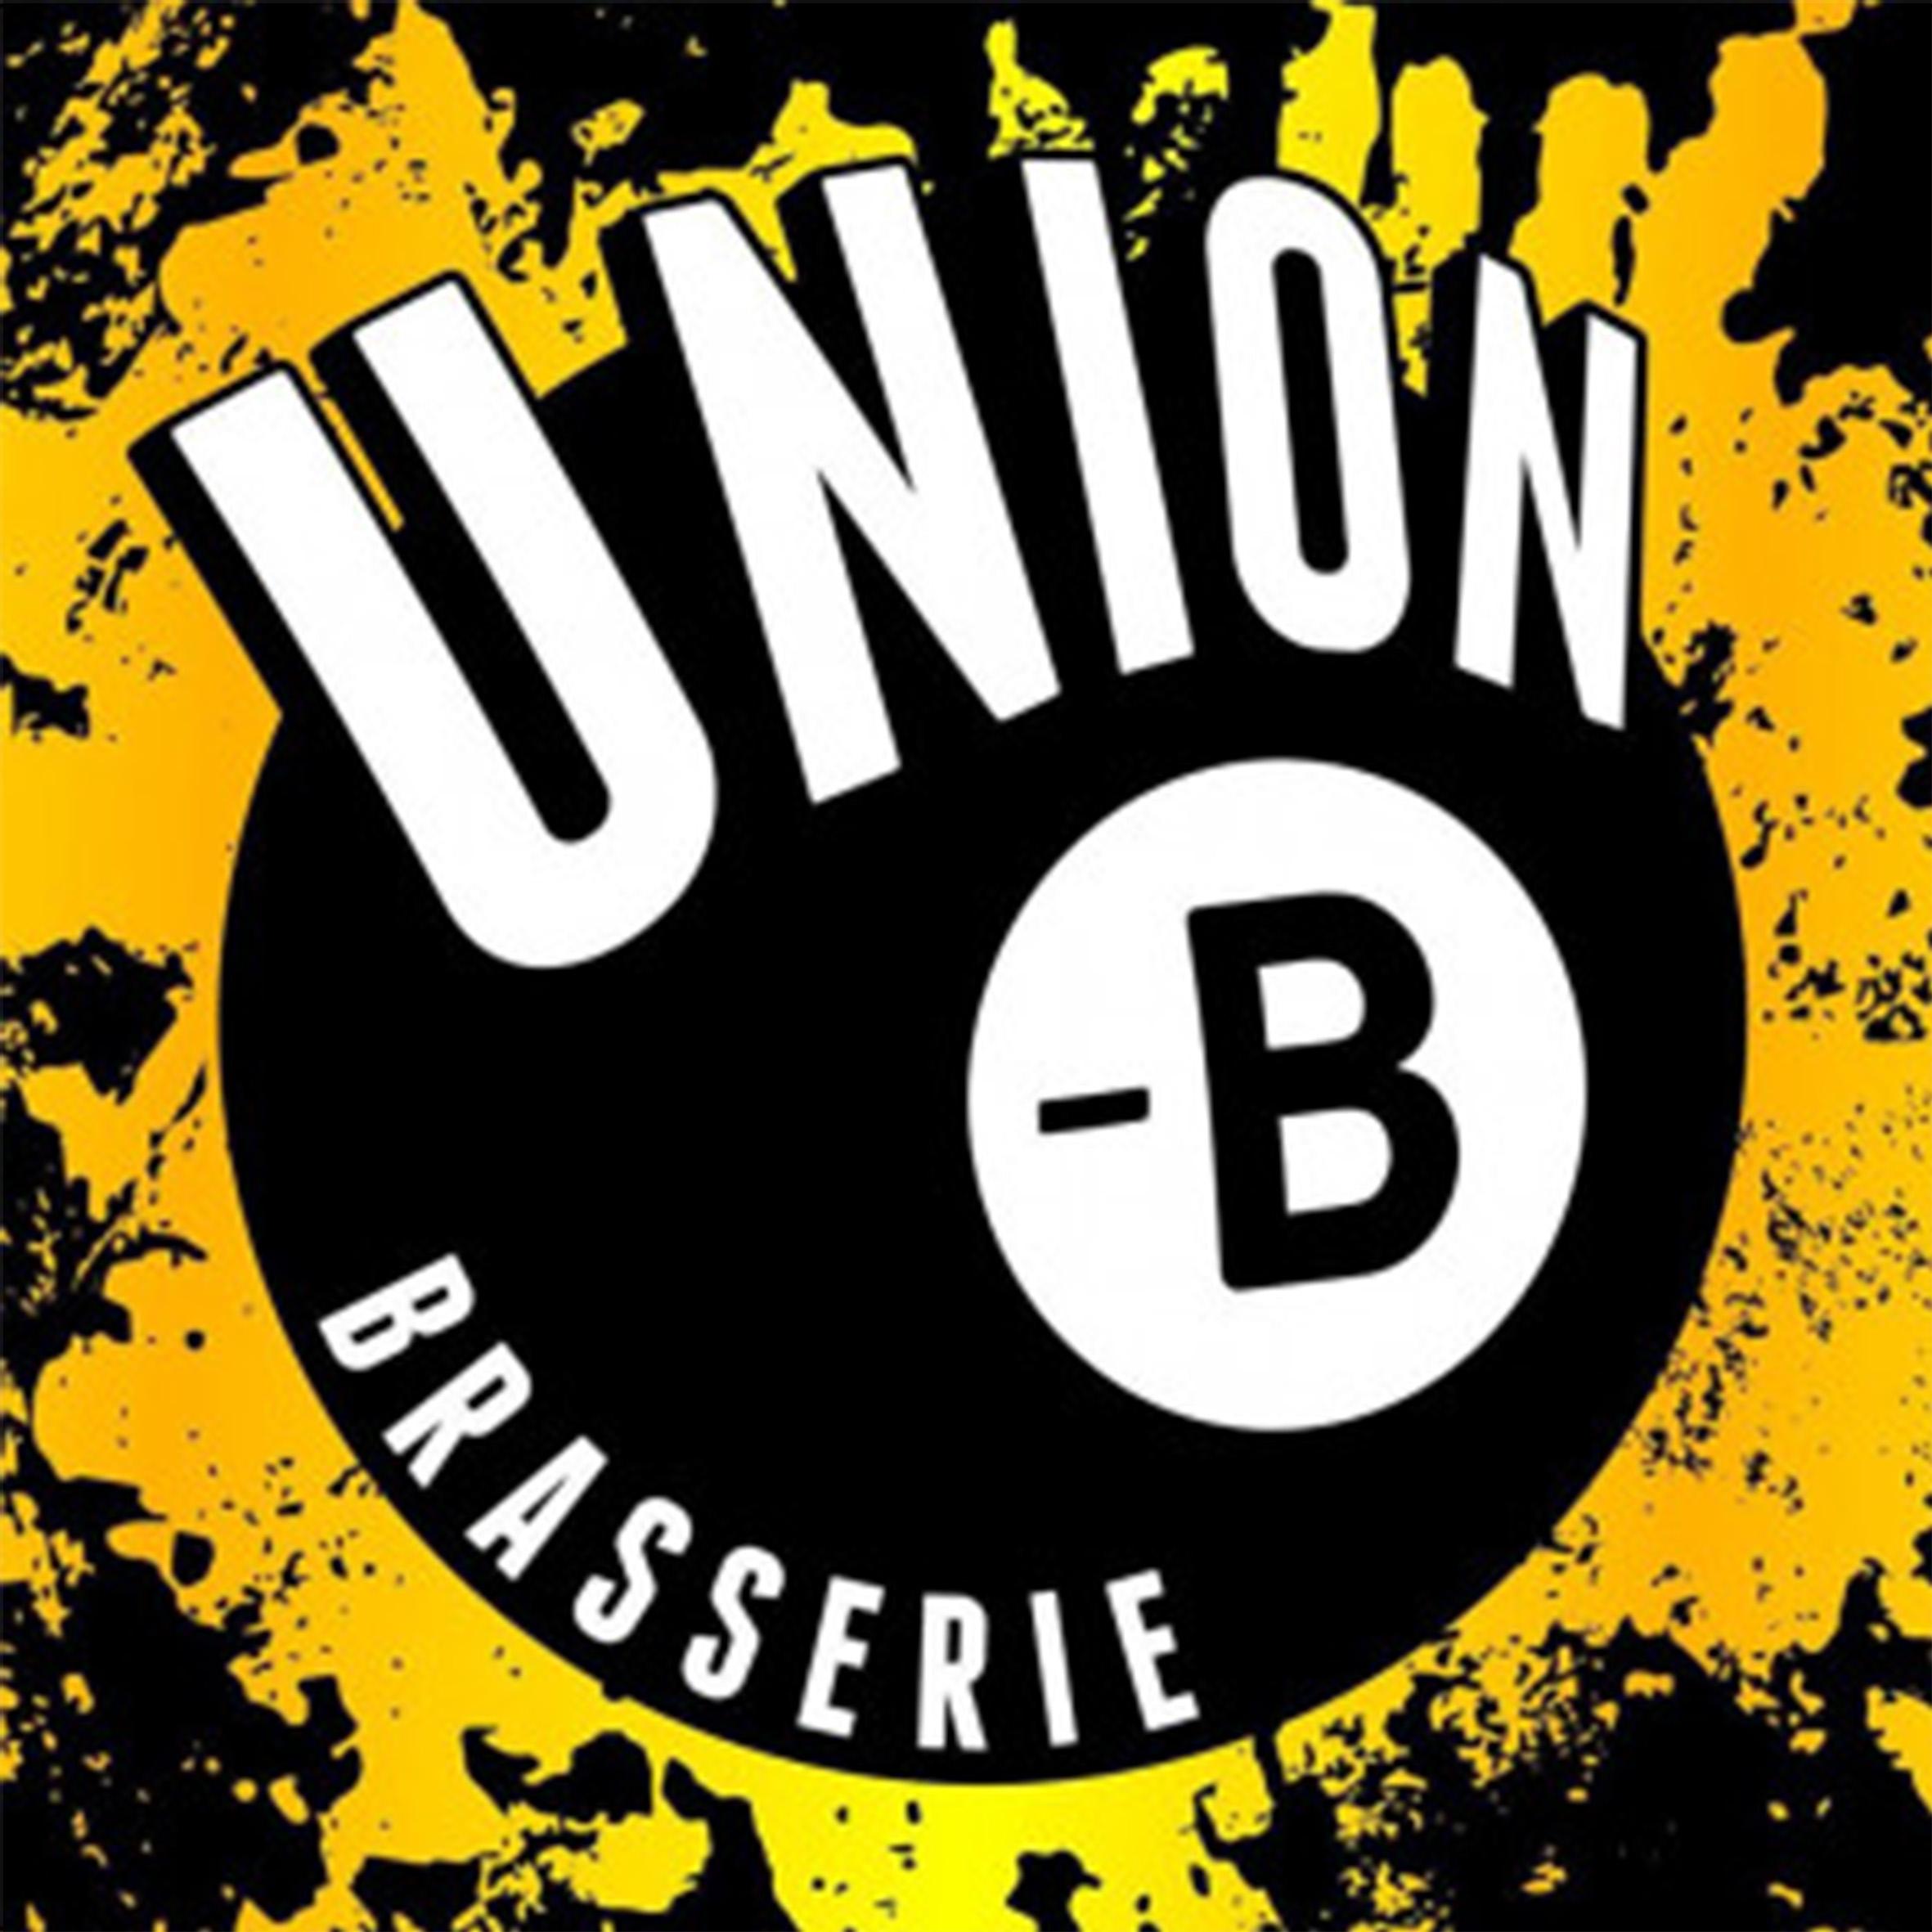 Brasserie Union-B